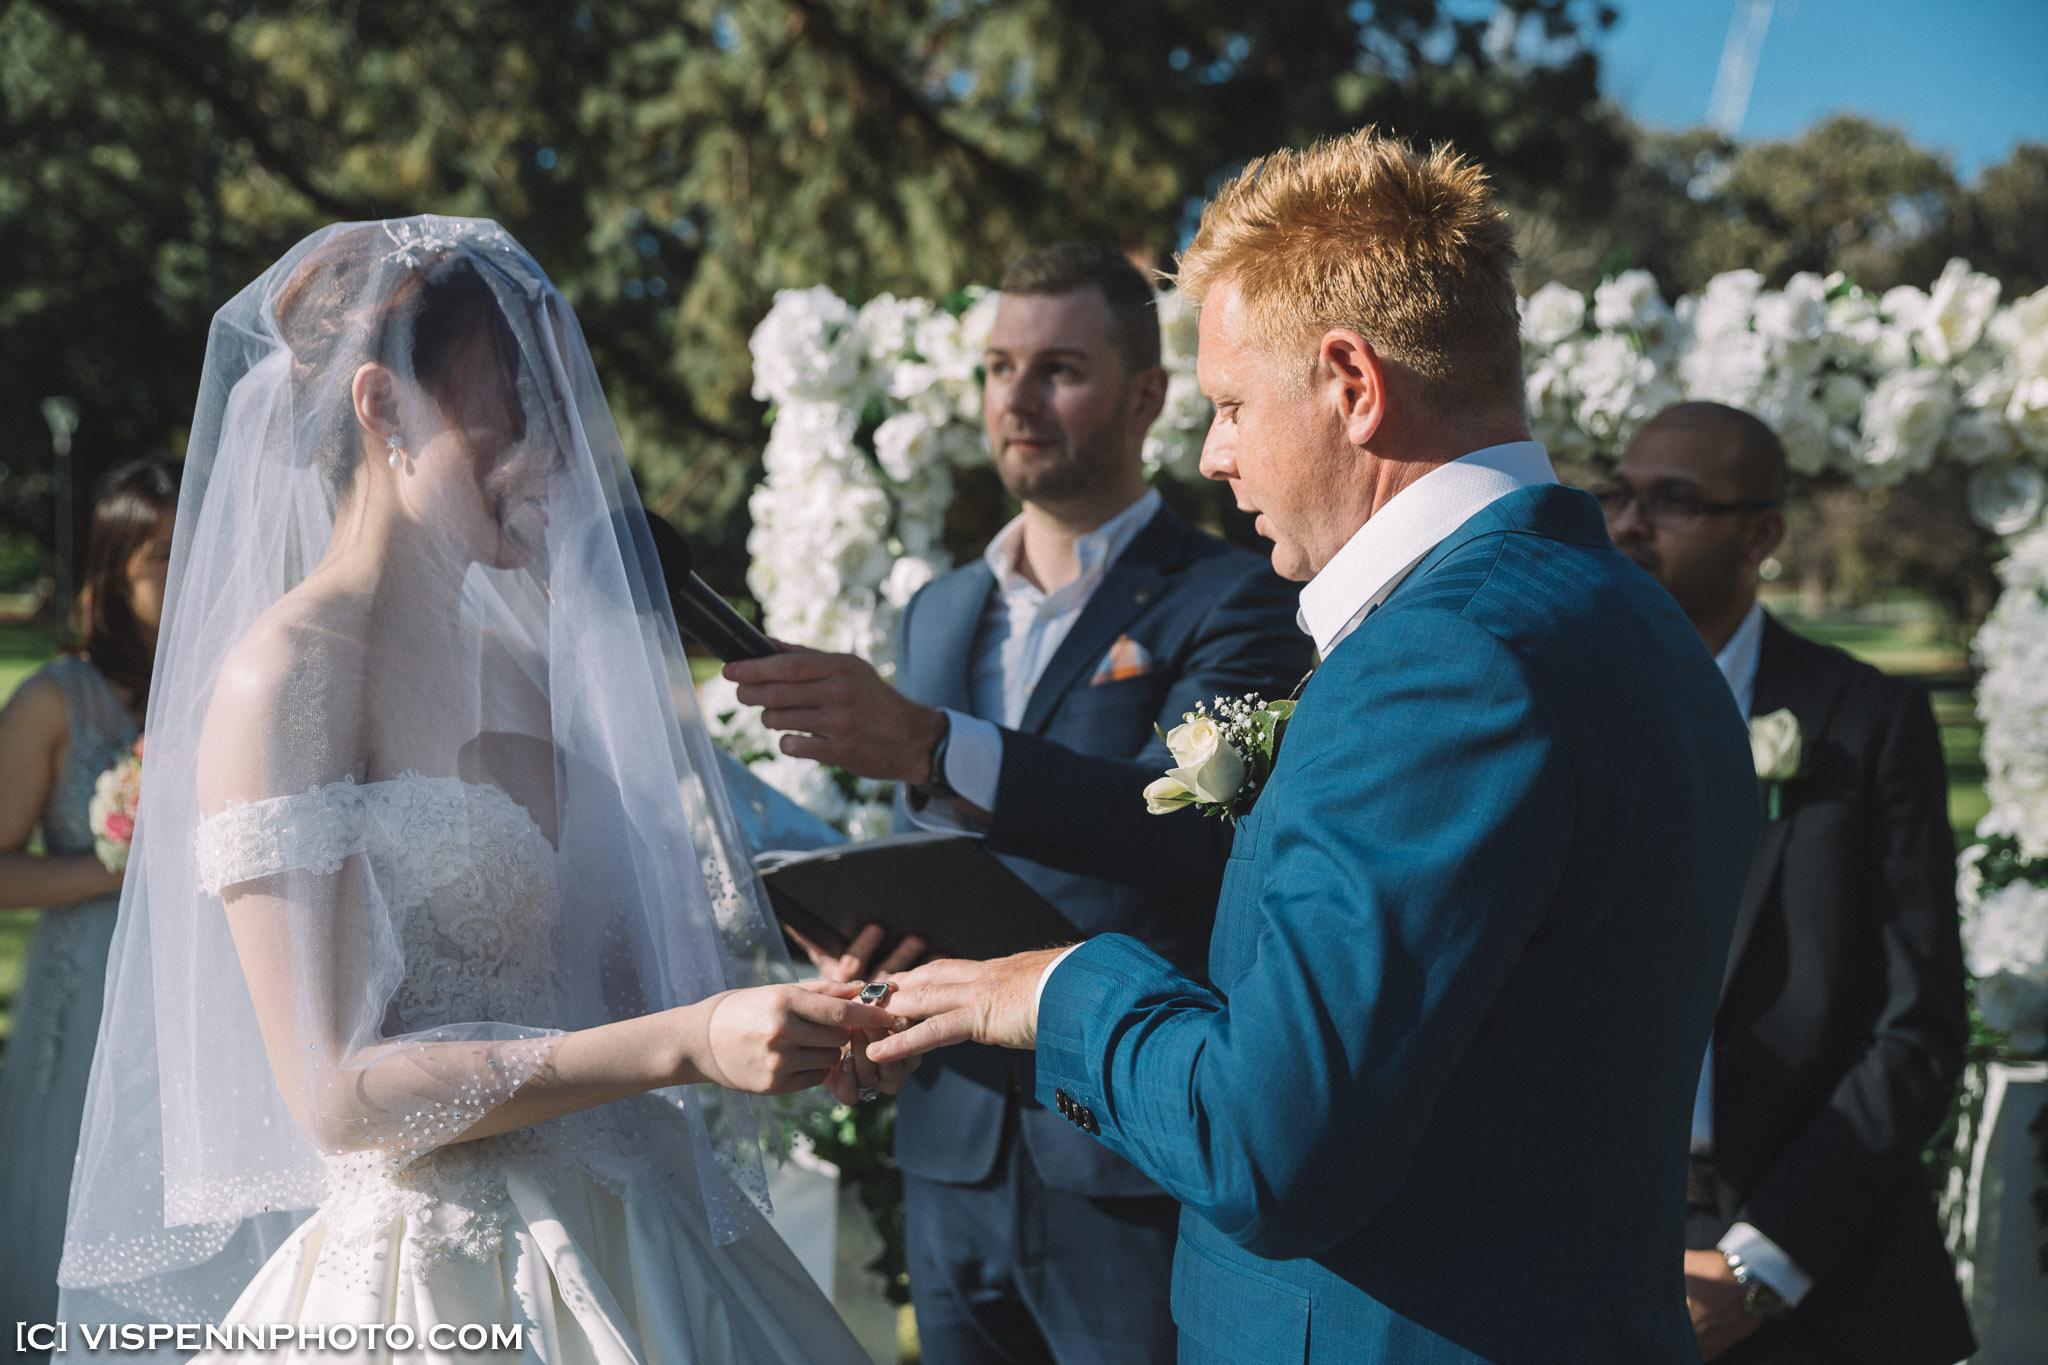 WEDDING DAY Photography Melbourne VISPENN 墨尔本 婚礼跟拍 婚礼摄像 婚礼摄影 结婚照 登记照 VISPENN 1P 1DX 01300